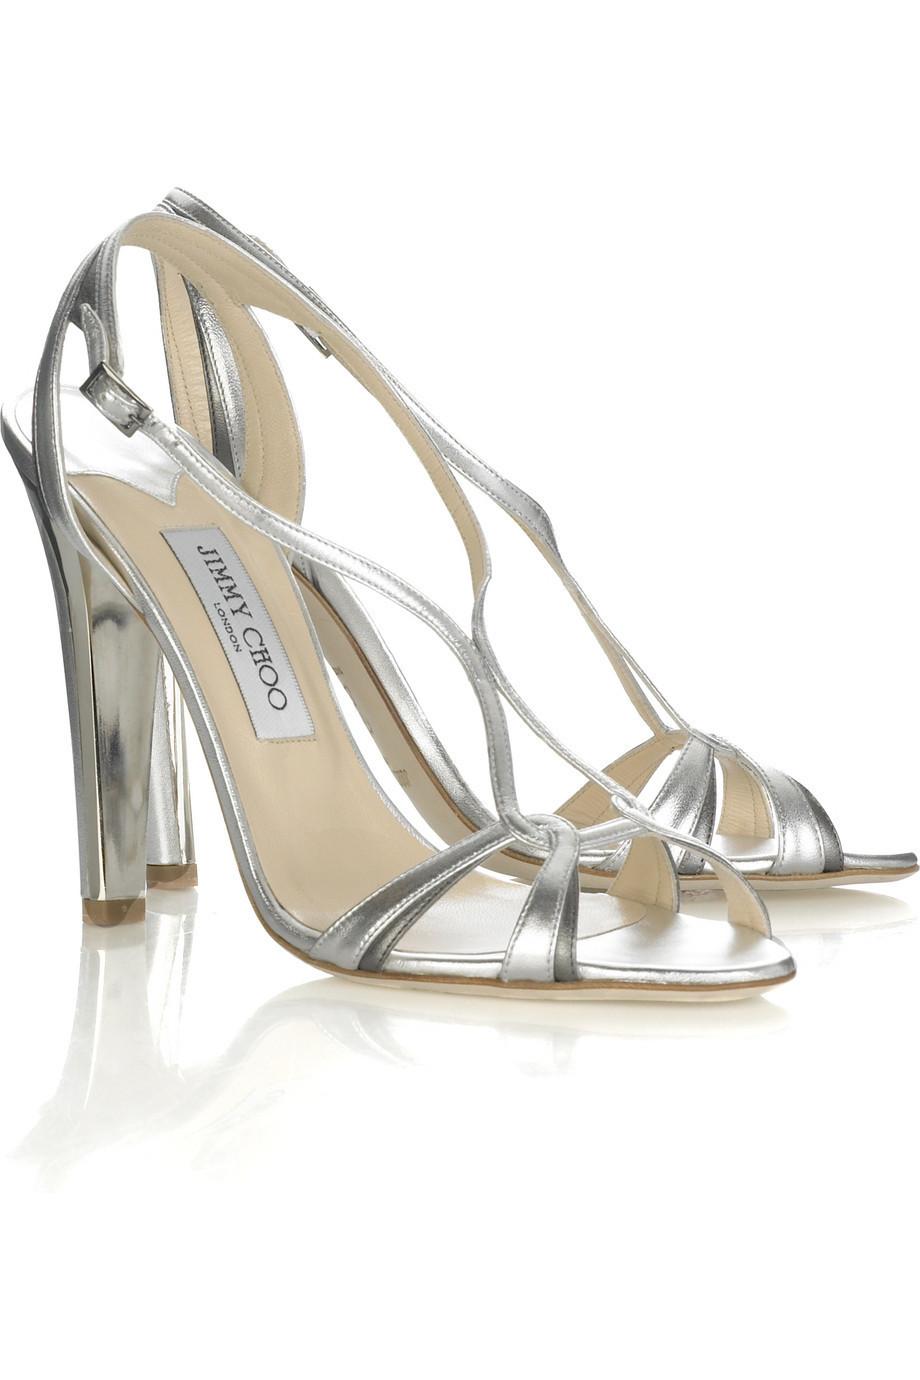 Jimmy Choo Leo metallic sandals | NET-A-PORTER.COM